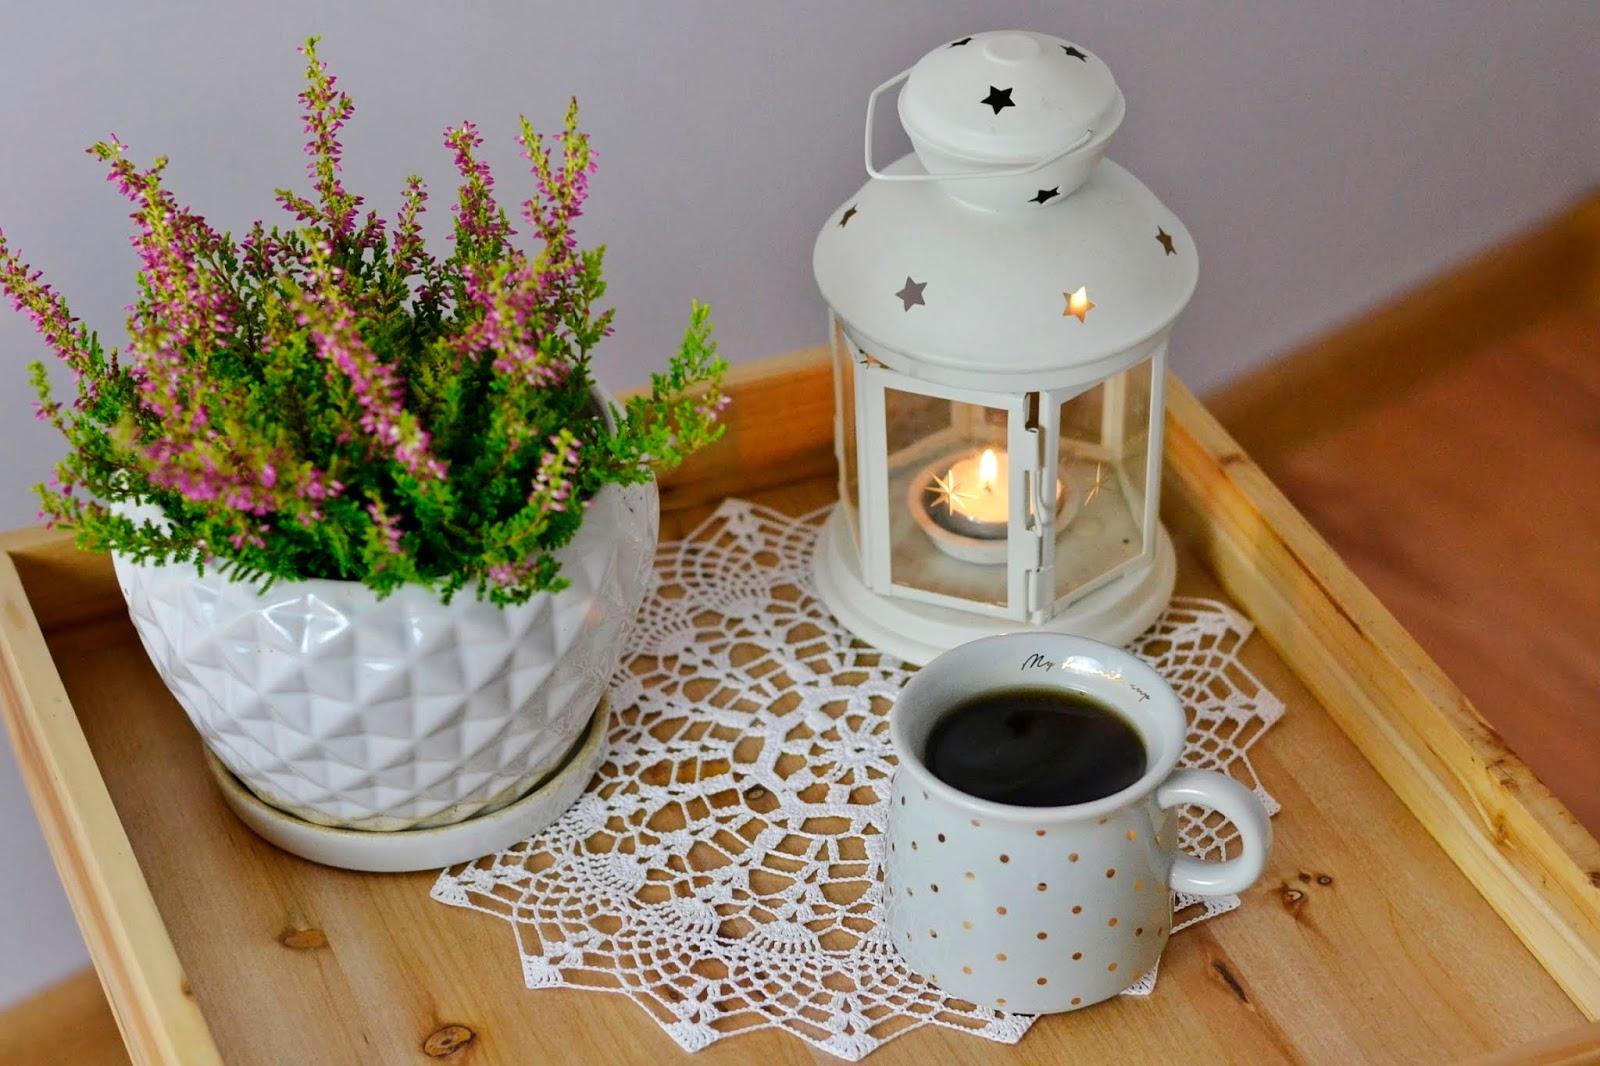 Polub jesień! Lista pomysłów na jesień do pobrania